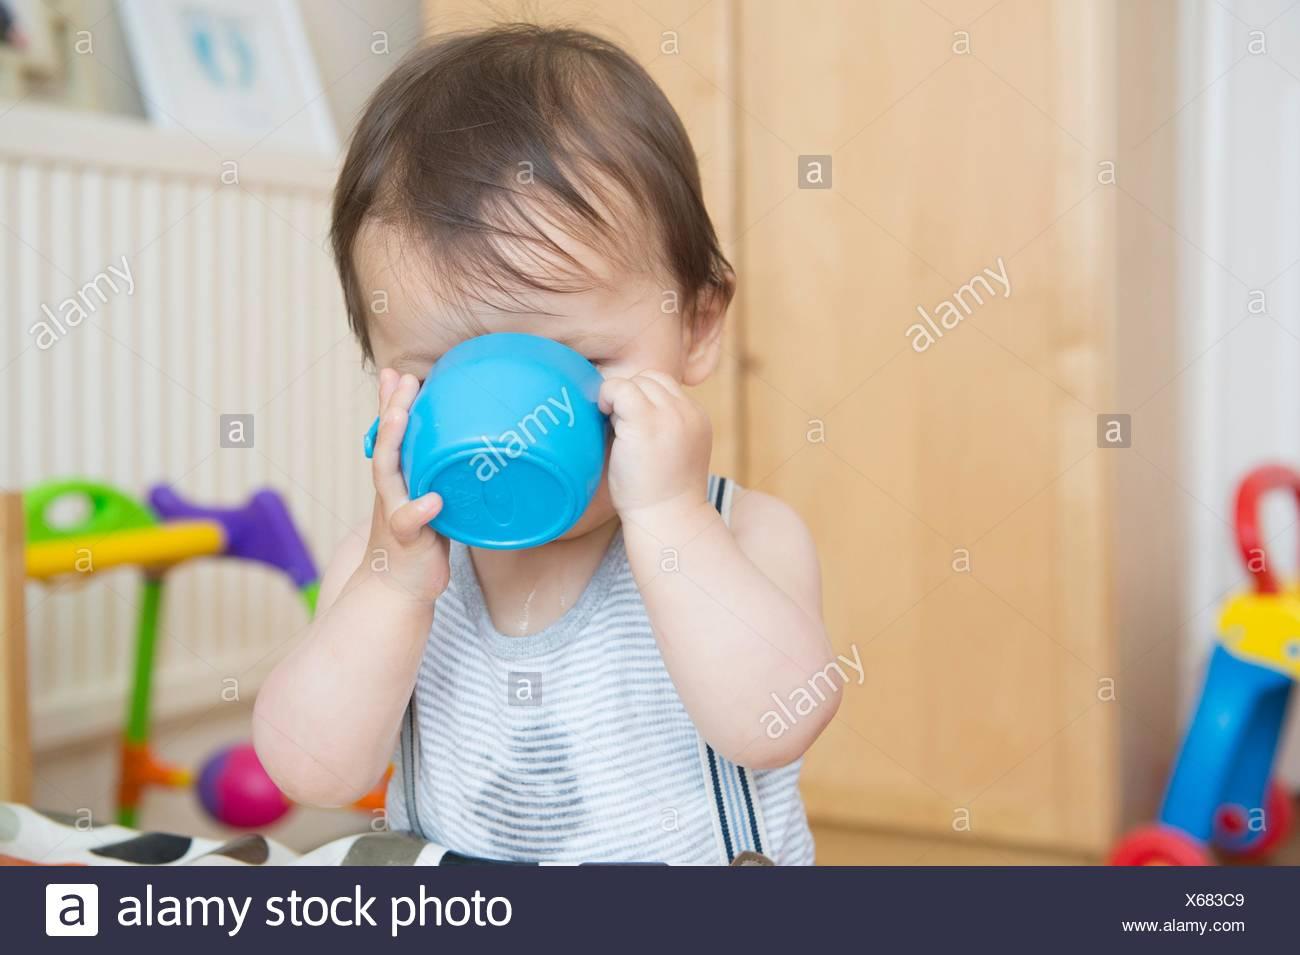 Bimbo a bere da baby cup in sala giochi Immagini Stock